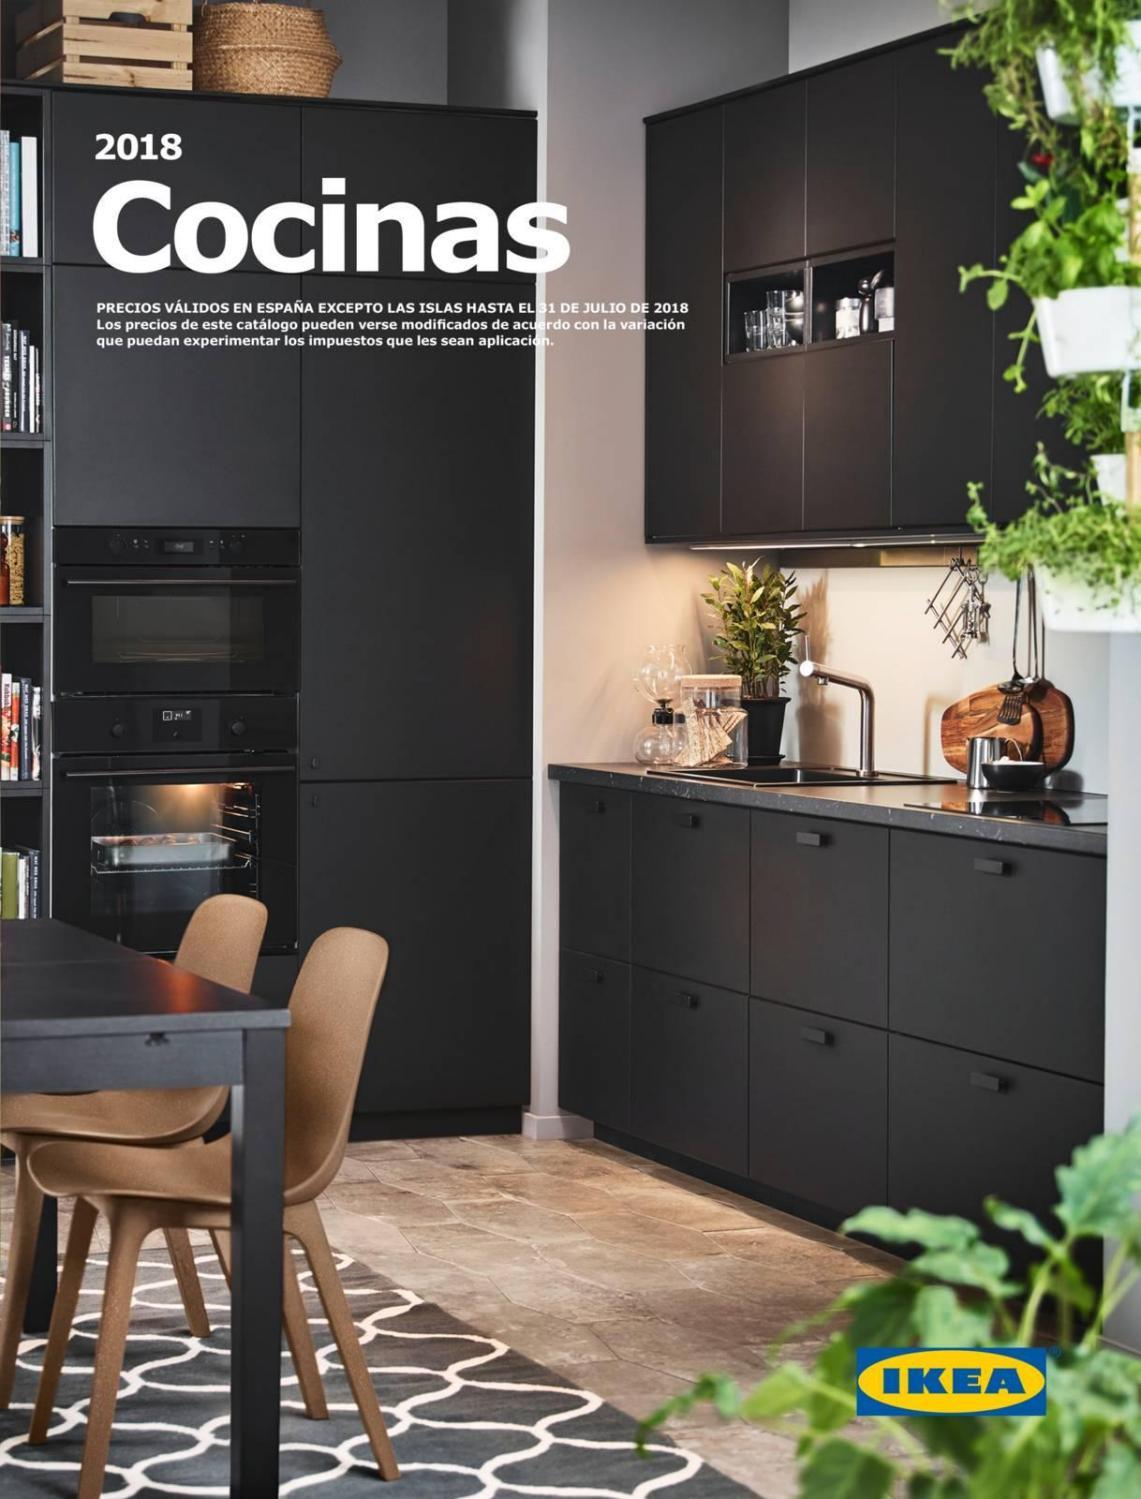 Catalogo ikea cocinas 2018 by Ofertas Supermercados - issuu